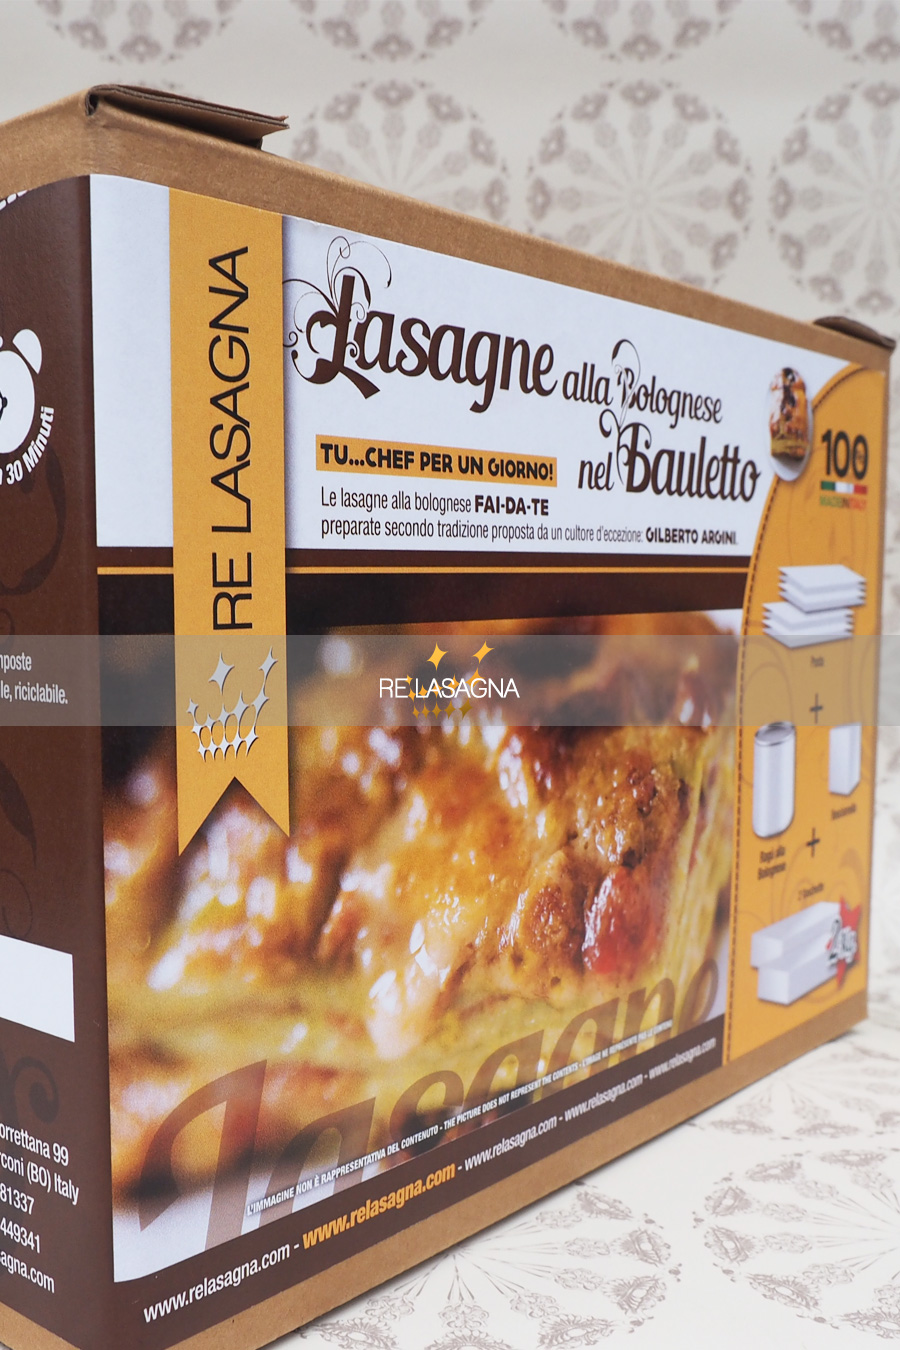 Lasagne alla Bolognese by Re Lasagna